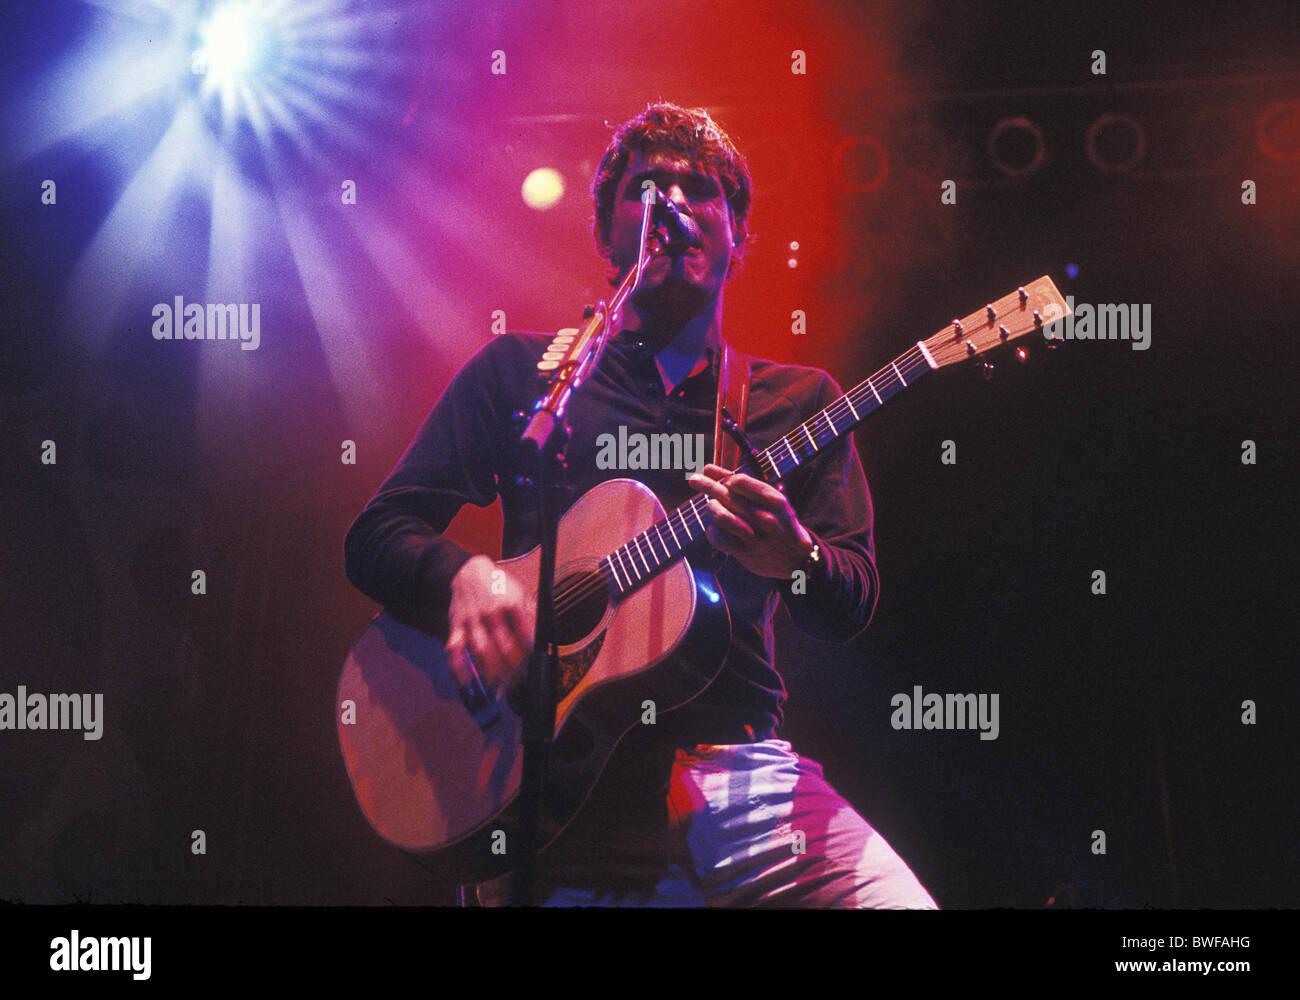 John Mayer in Concert - Stock Image